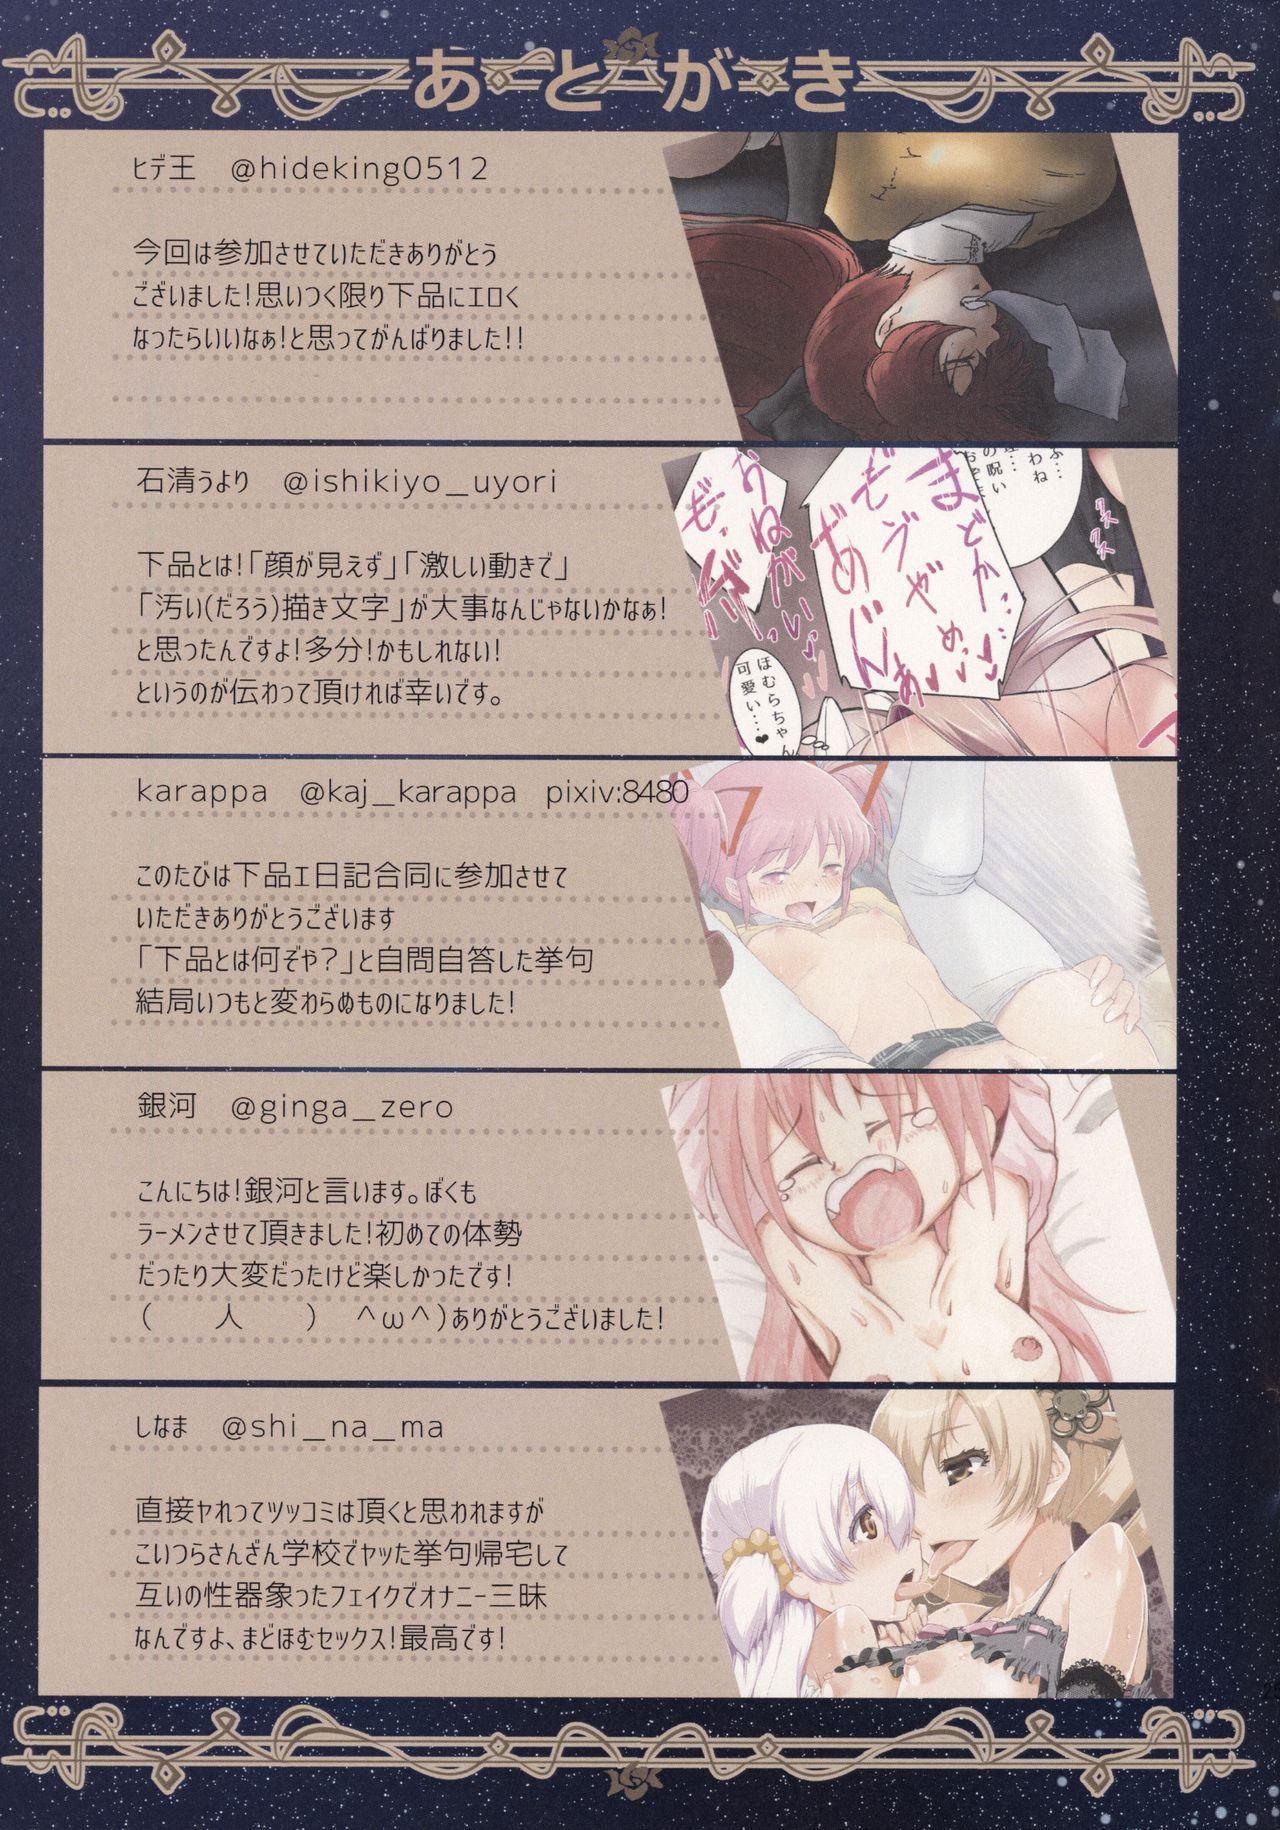 Mahou Shoujo Madoka Magica Gehin Ero Enikki Goudou 24